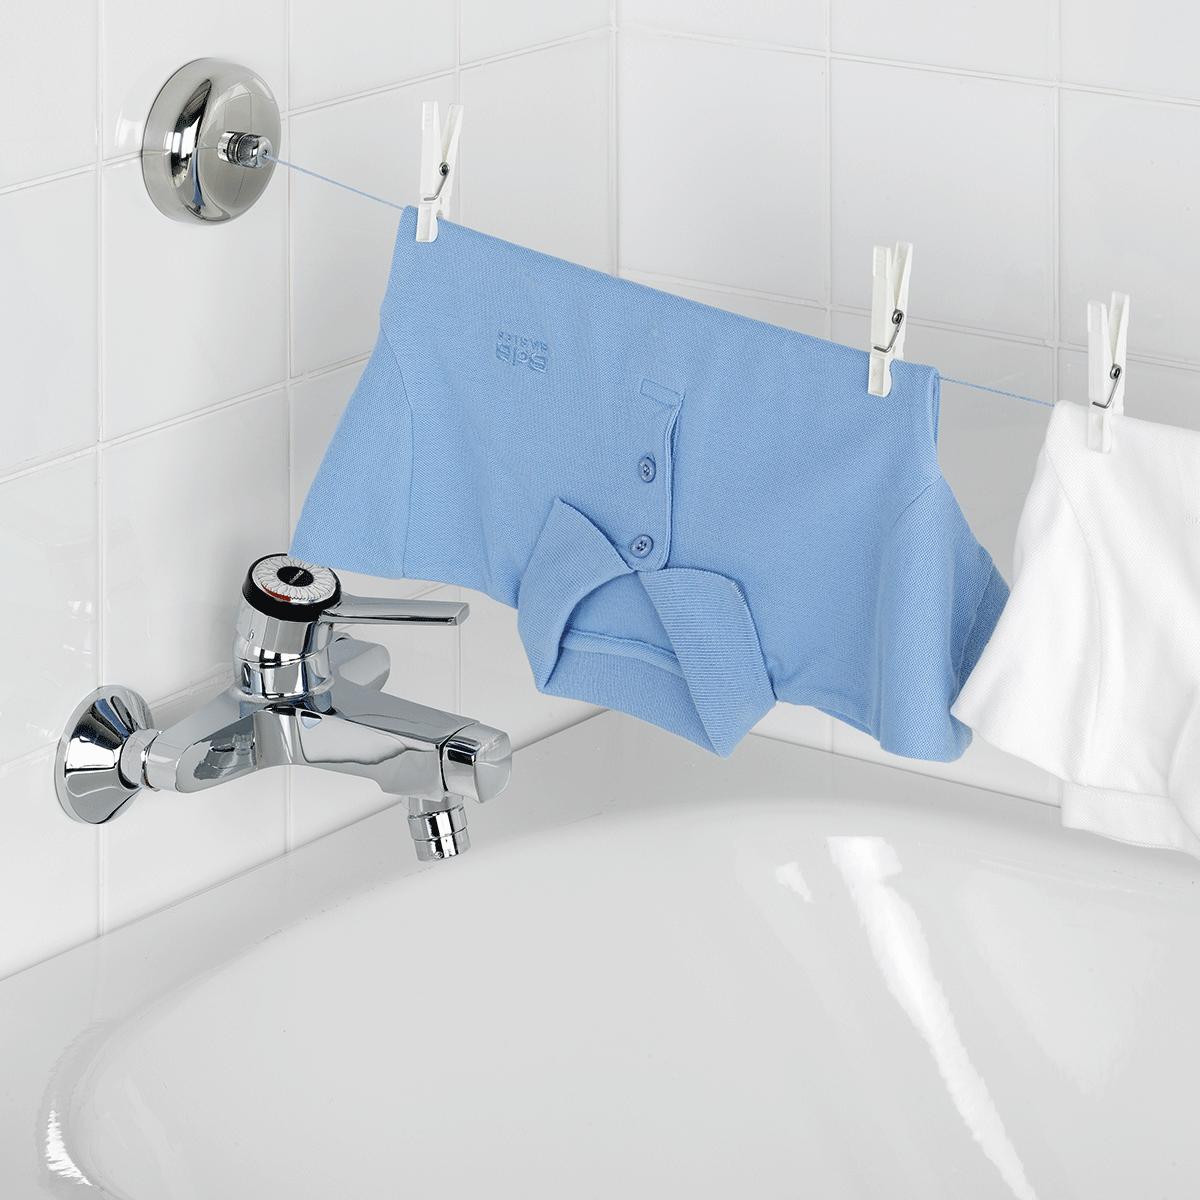 corde linge r tractable en inox buanderie etendoir buanderie en 2019 pinterest. Black Bedroom Furniture Sets. Home Design Ideas